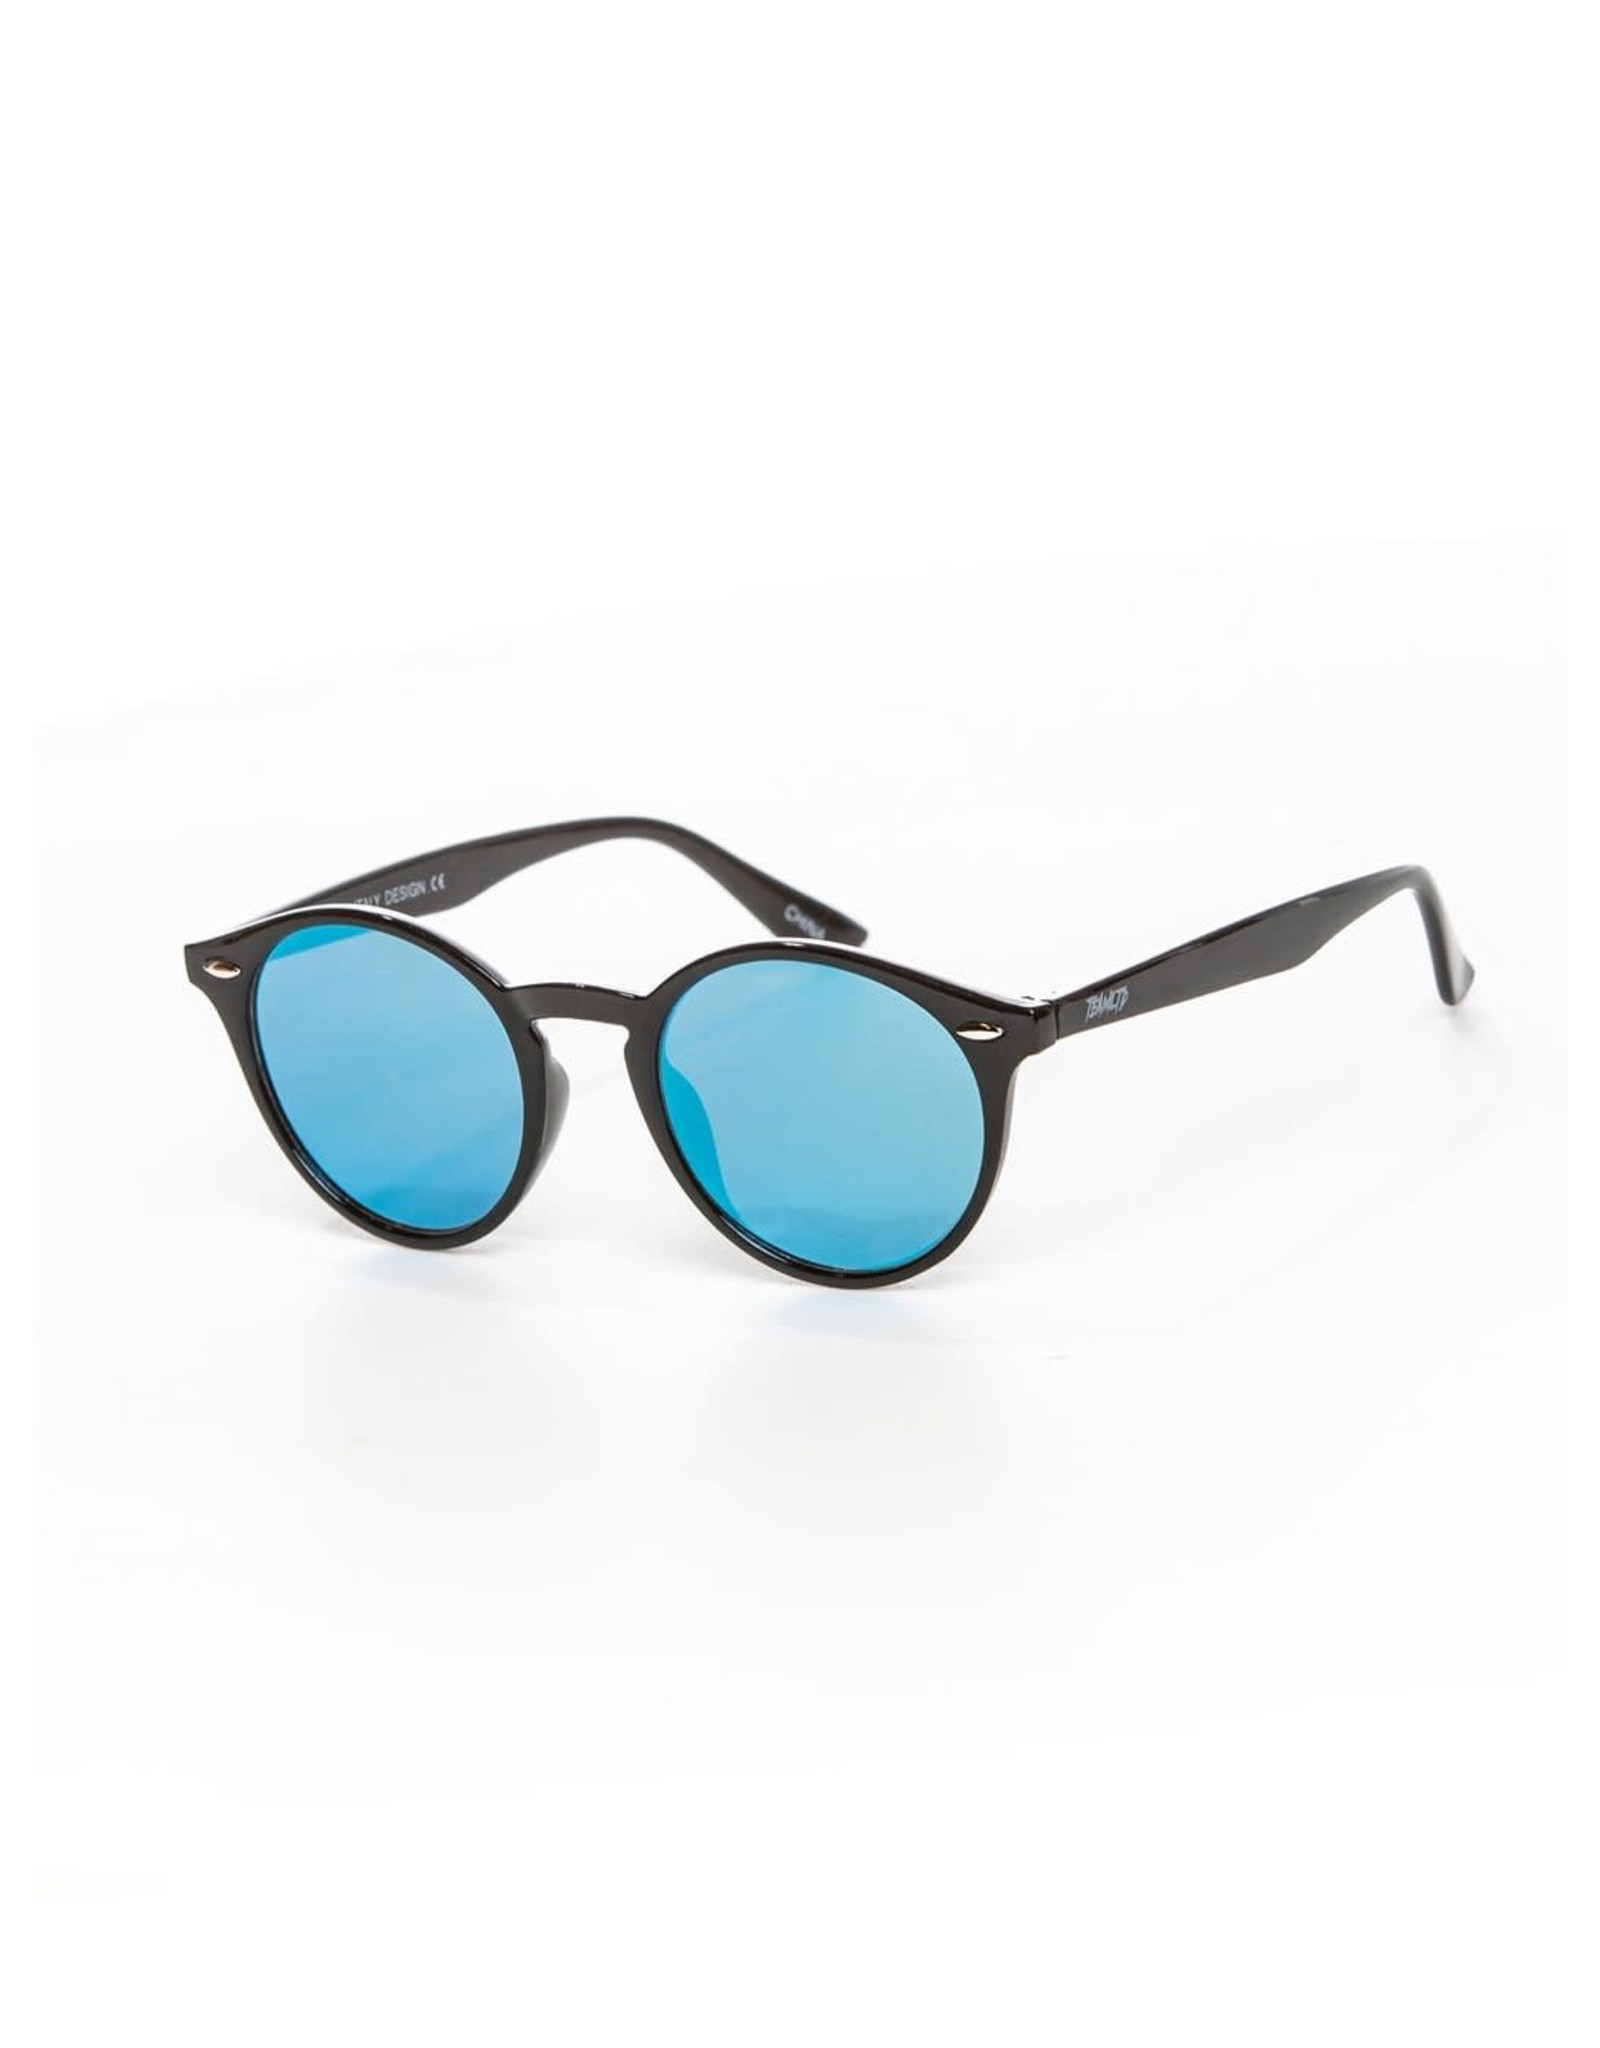 Team LTD Instinct Sunglasses